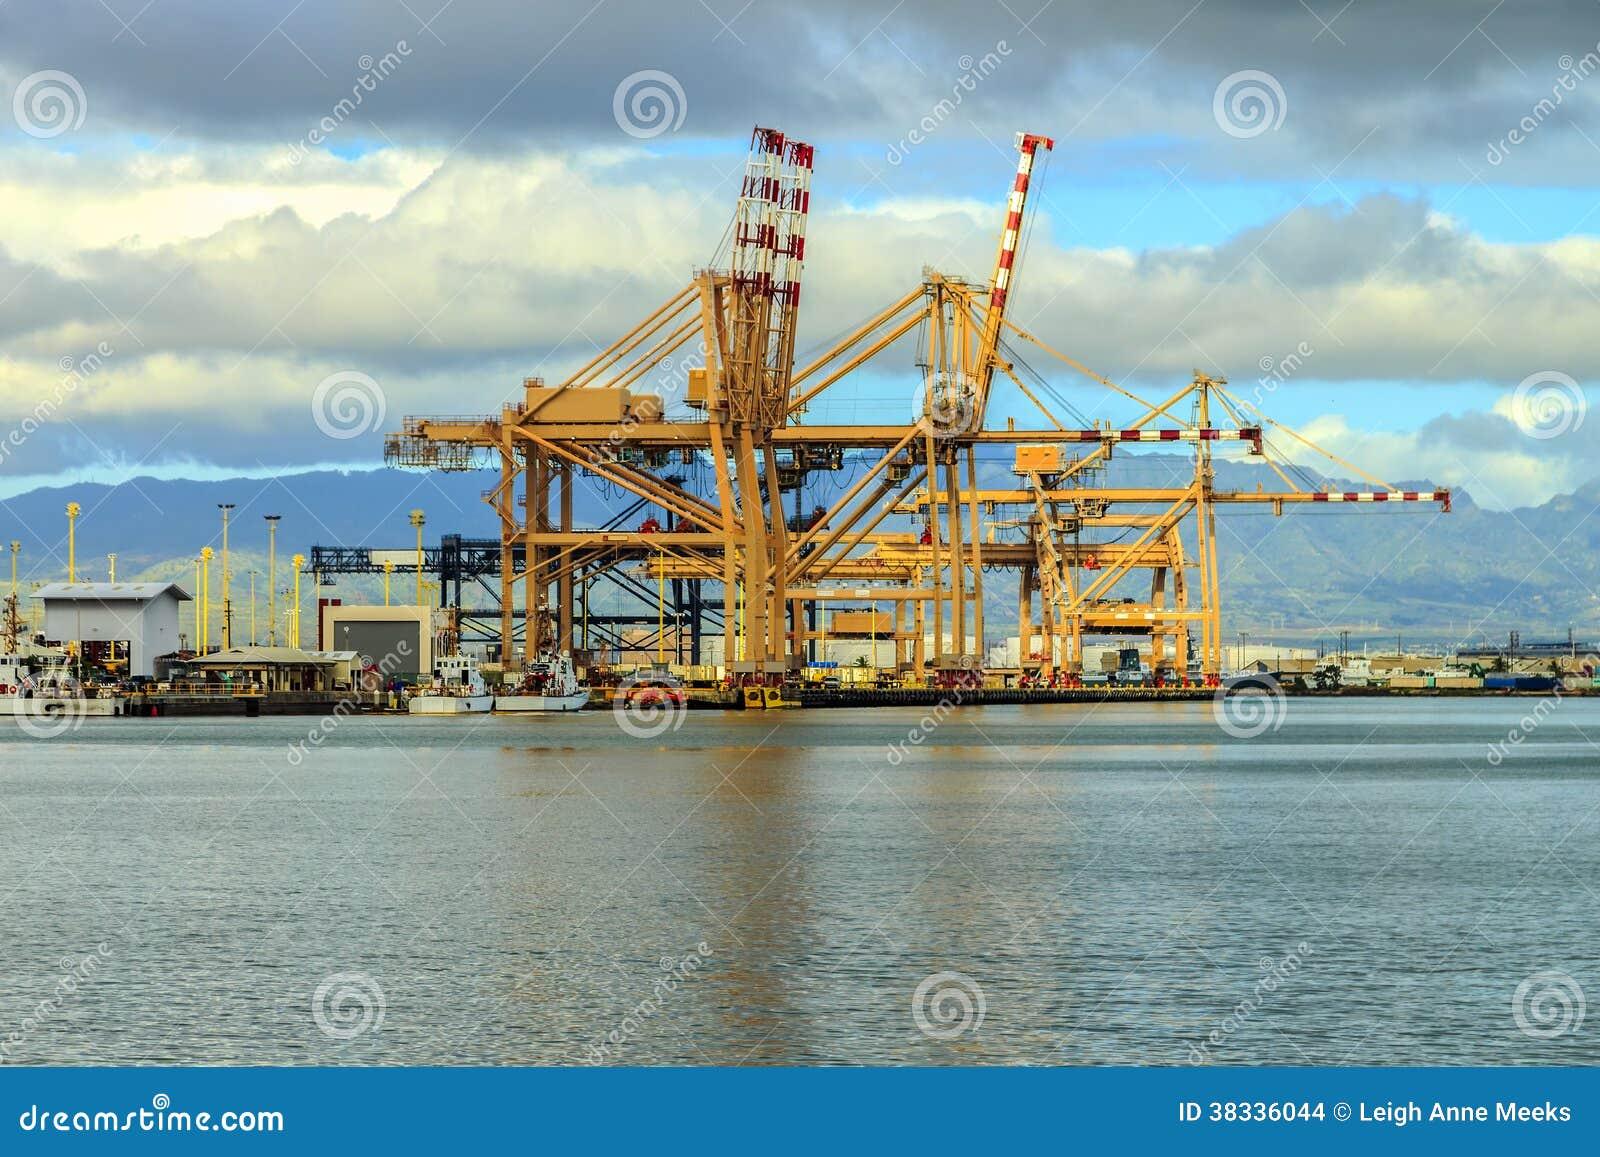 Port Of Honolulu >> Port Of Honolulu Stock Photo Image Of Port Docks Mountains 38336044